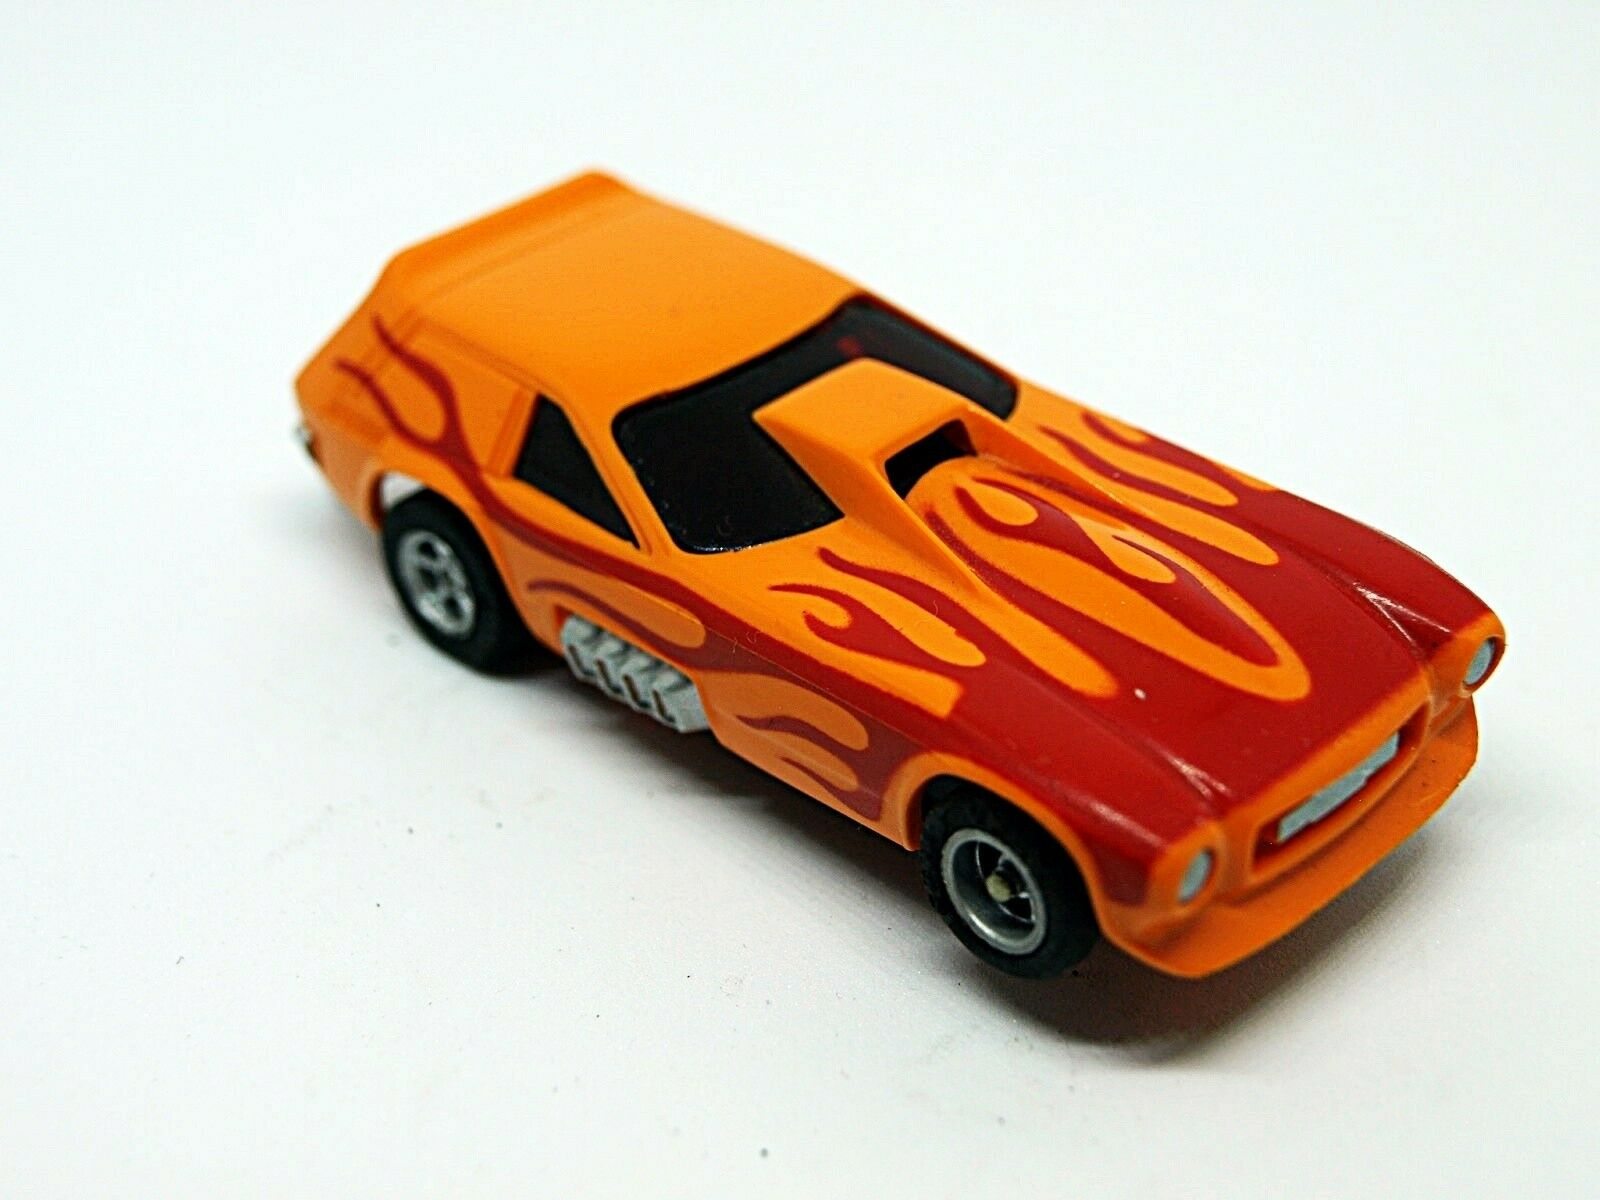 Aurora AFX Ho ranura de coche Vega van Gasser naranja roja llamas con Wheelie bares difícil de encontrar